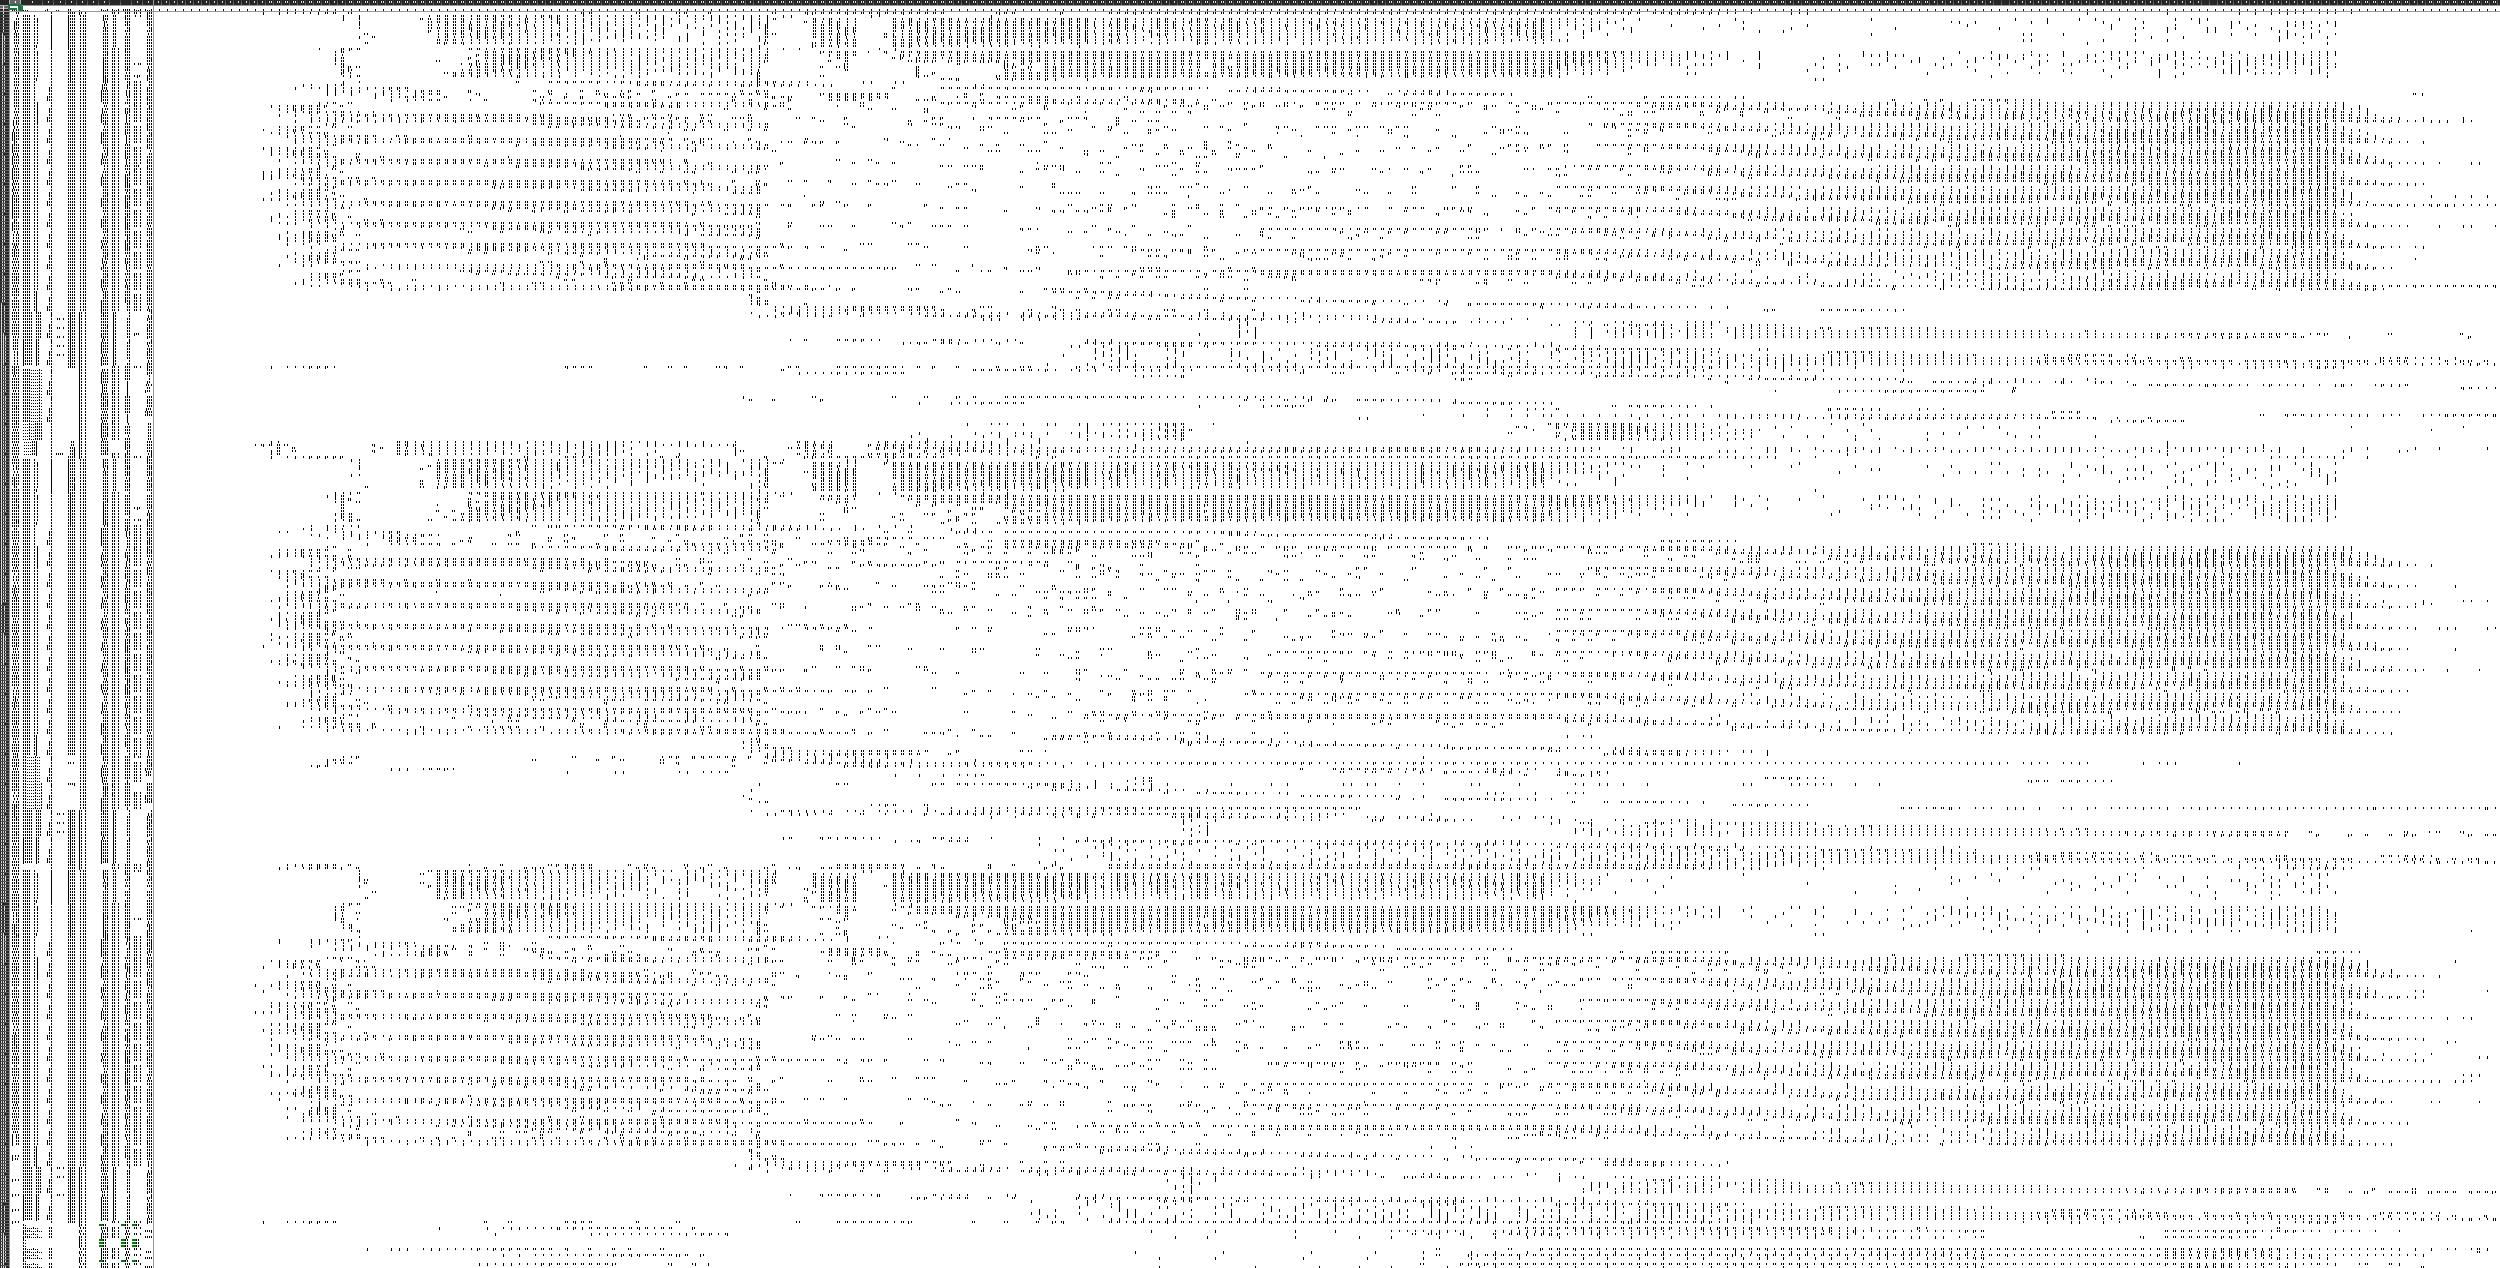 sheet-source.png